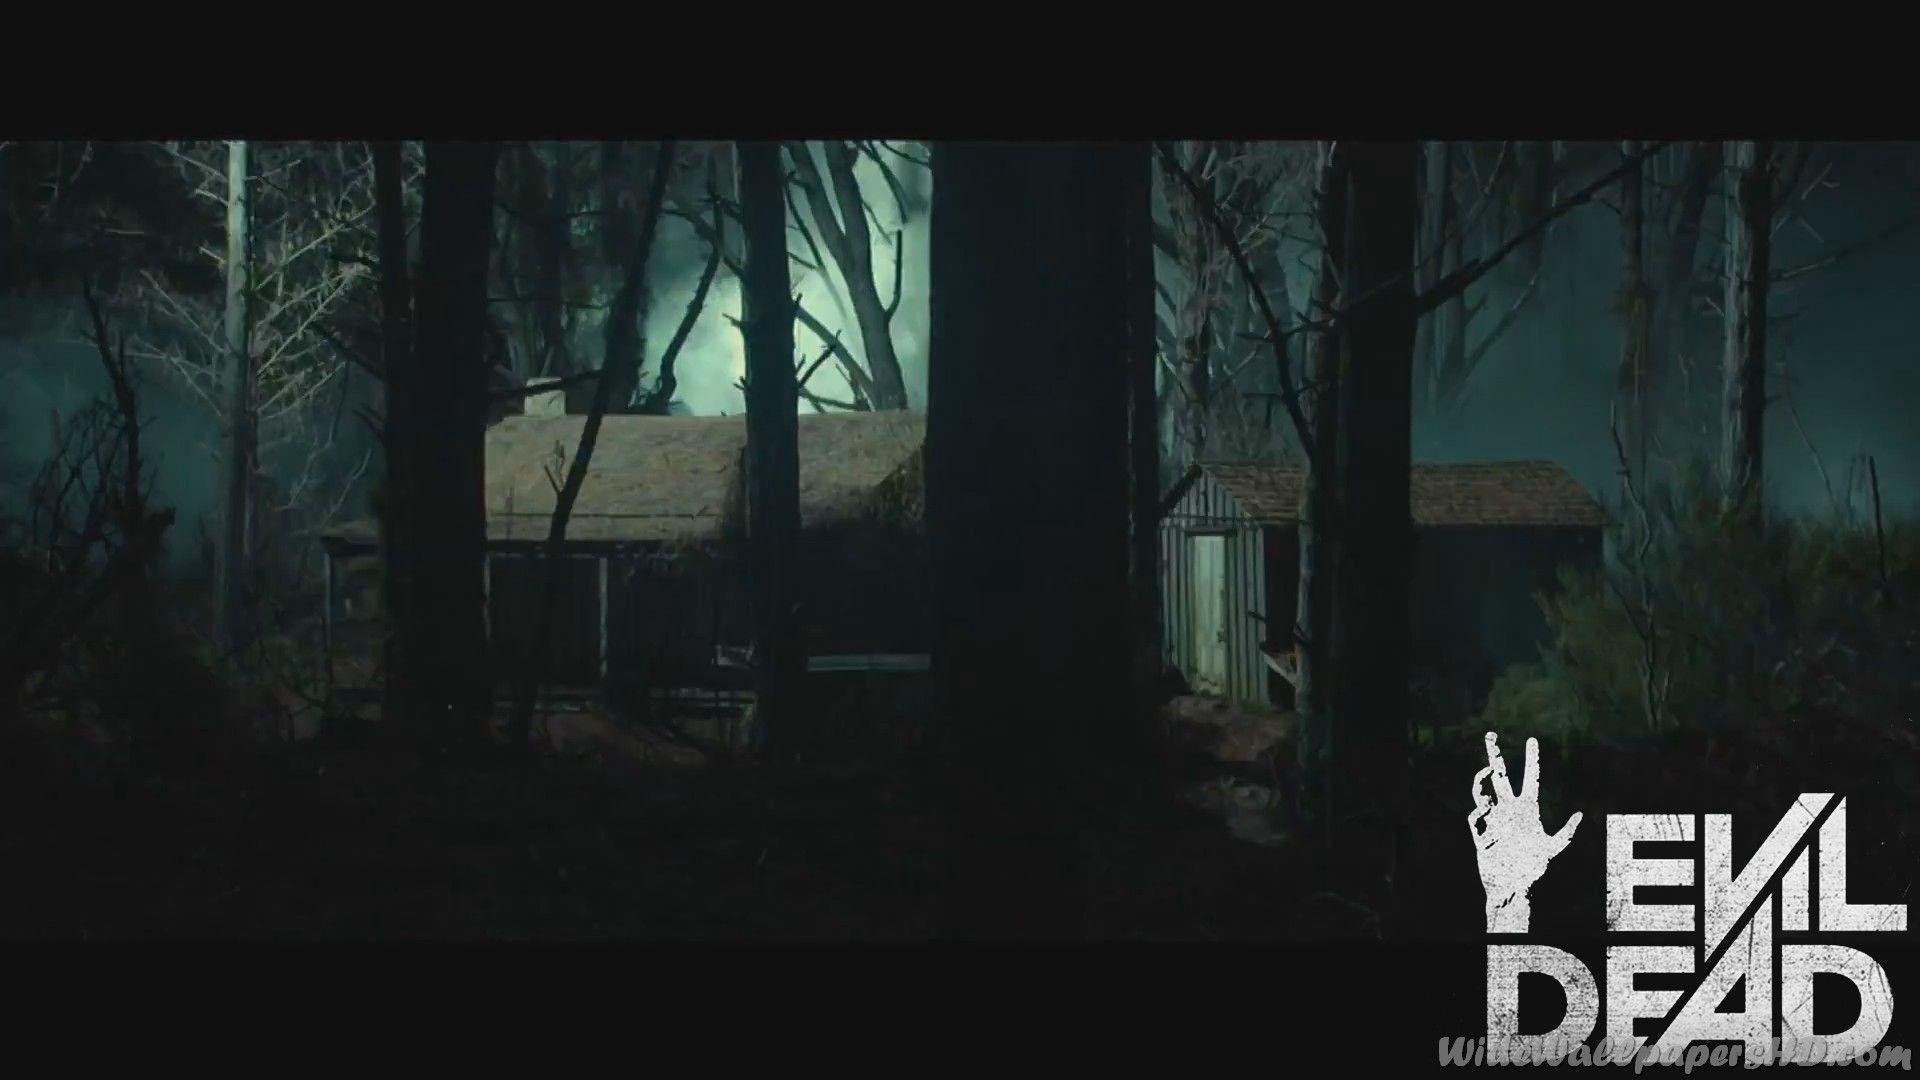 evil dead wallpaper 1920x1080 - photo #45